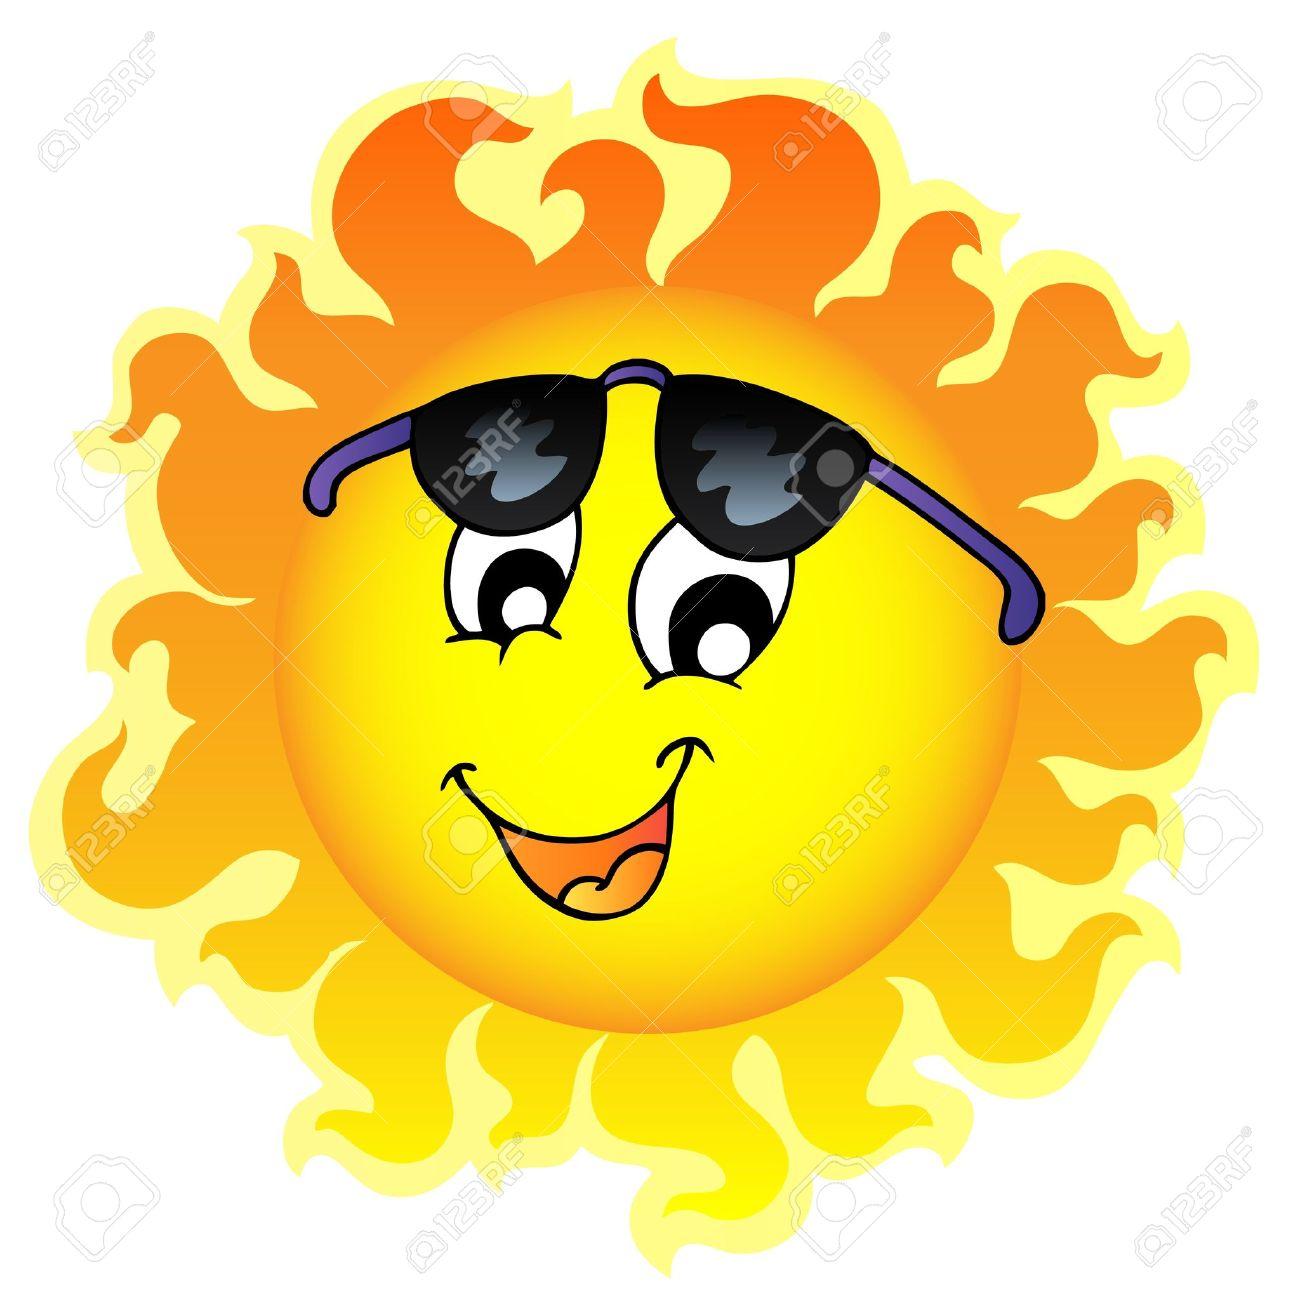 cute funny sun with sunglasses illustration royalty free cliparts rh 123rf com Sun Face Drawings Cartoon Sun